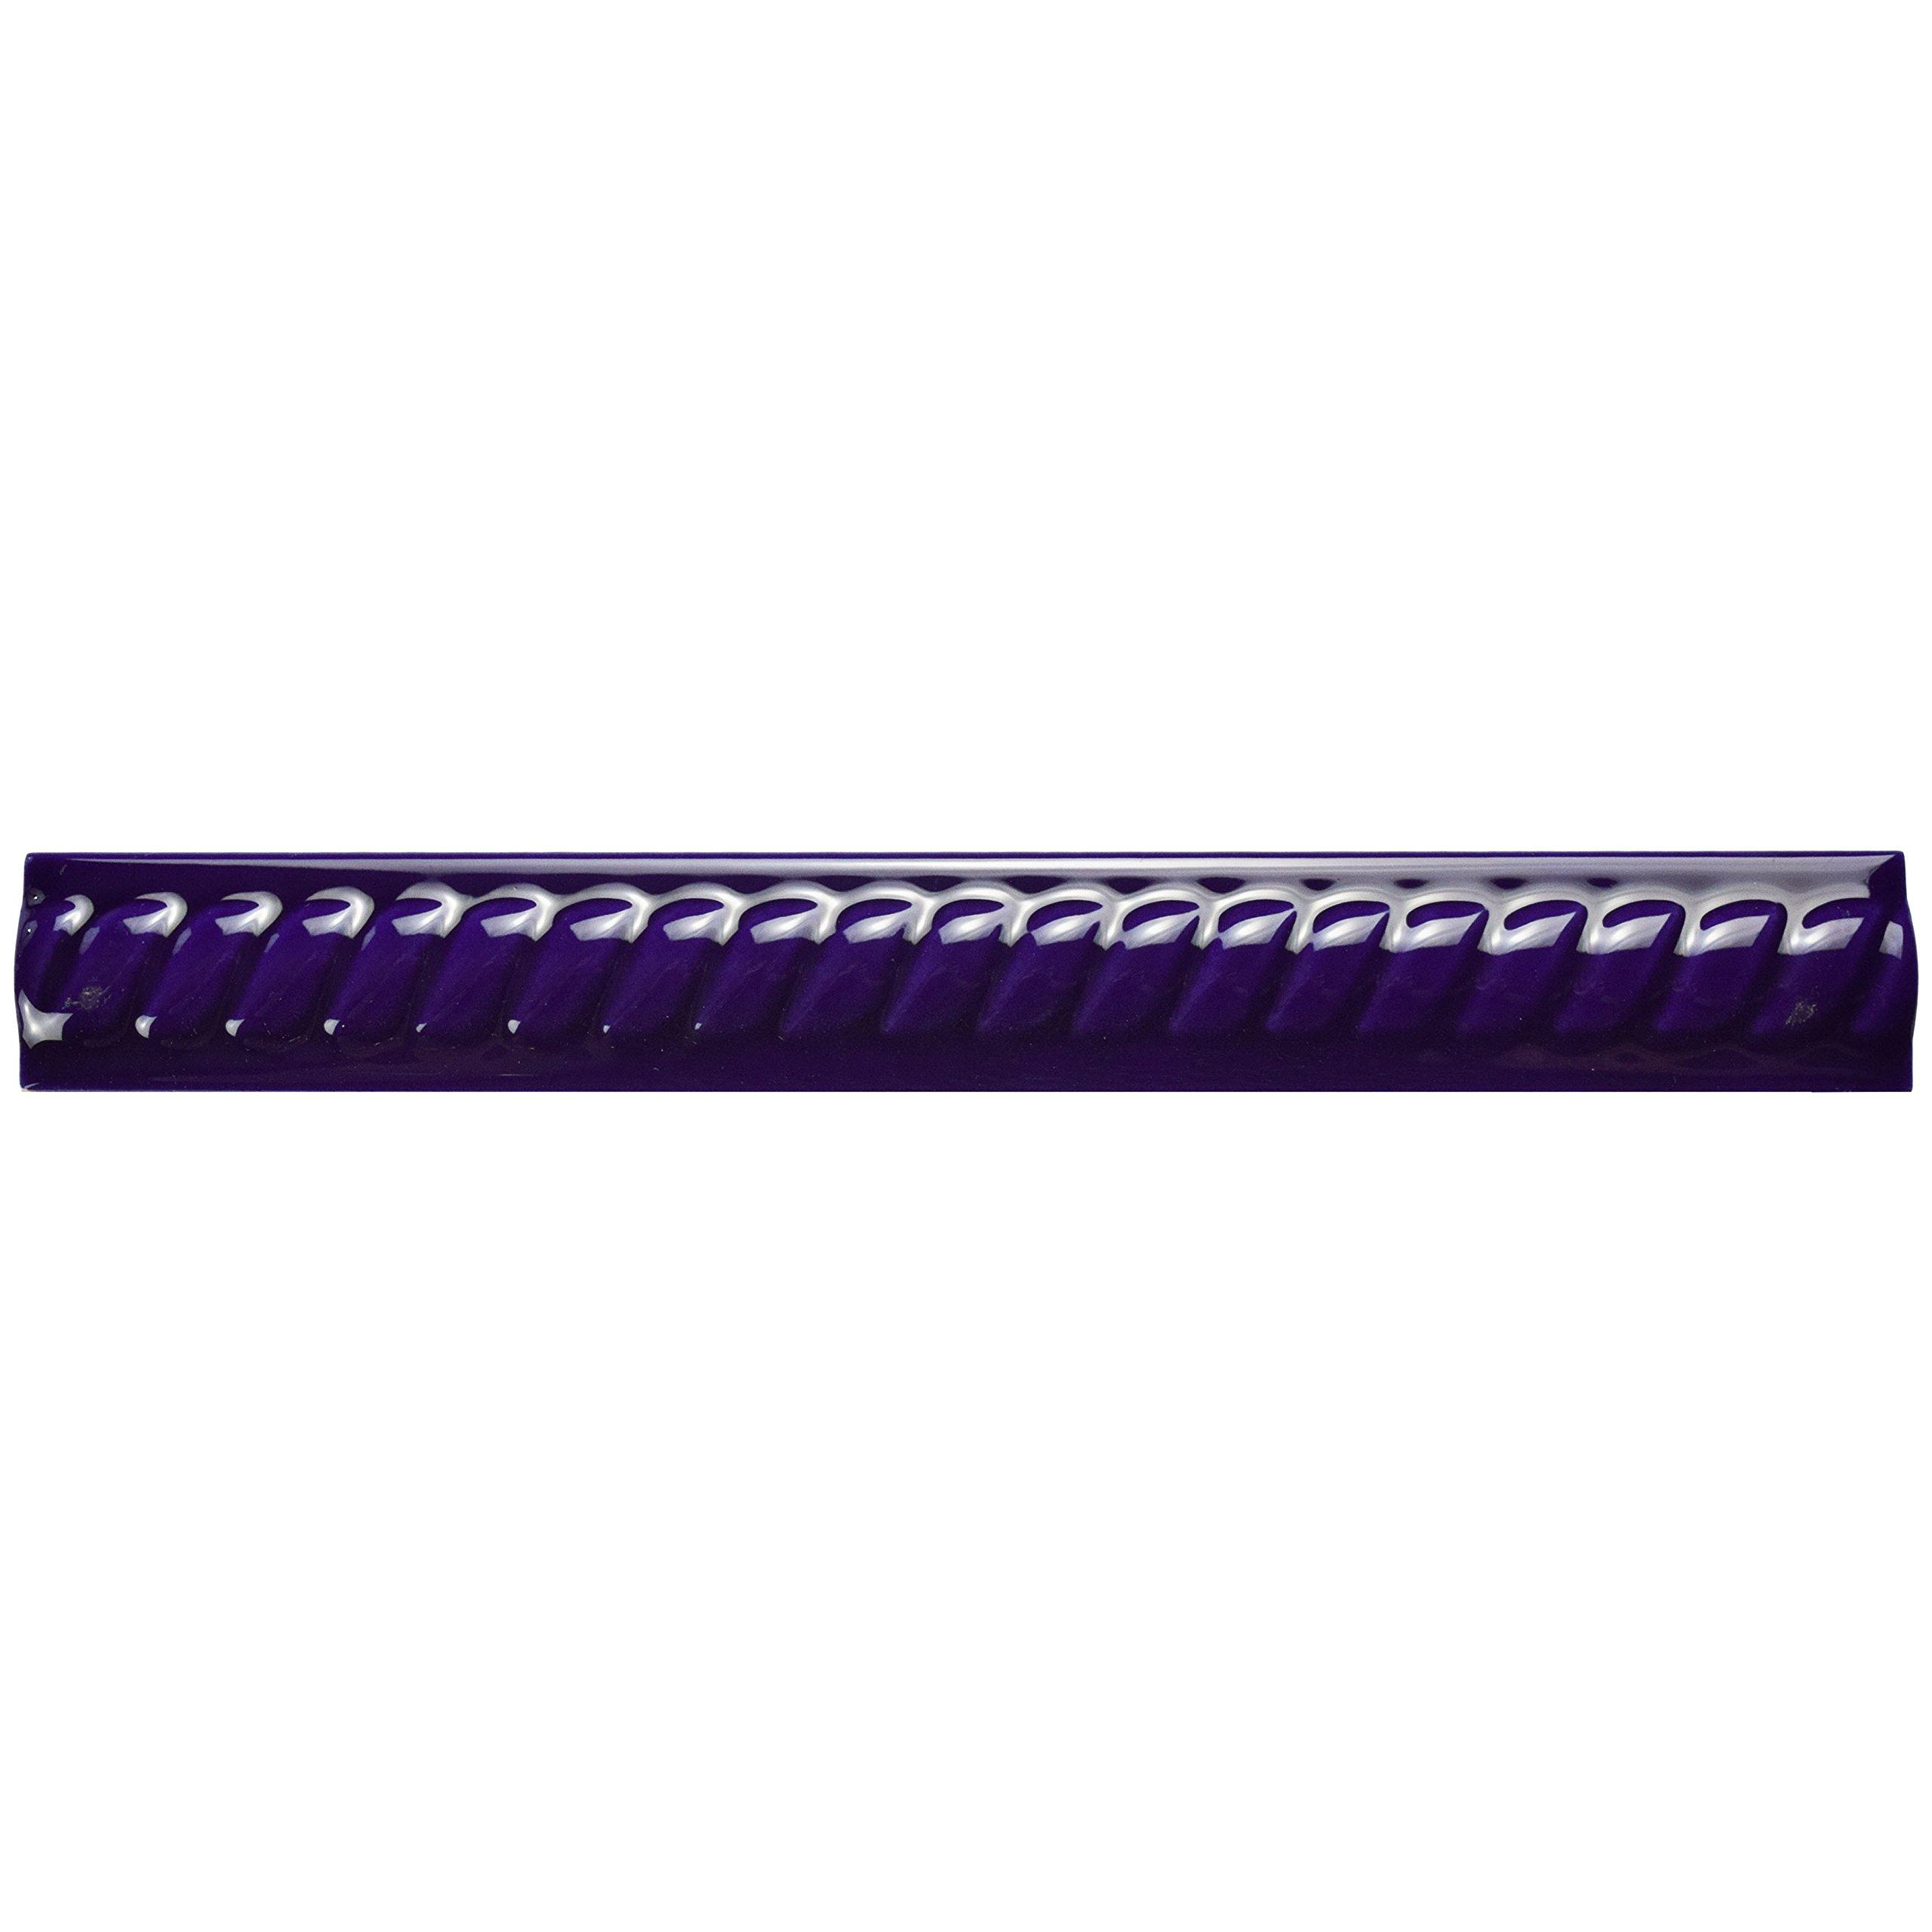 SomerTile WAT8TCM Trenzo Ceramic Moldura Pencil Trim Tile, 1'' x 7.88'', Cobalto